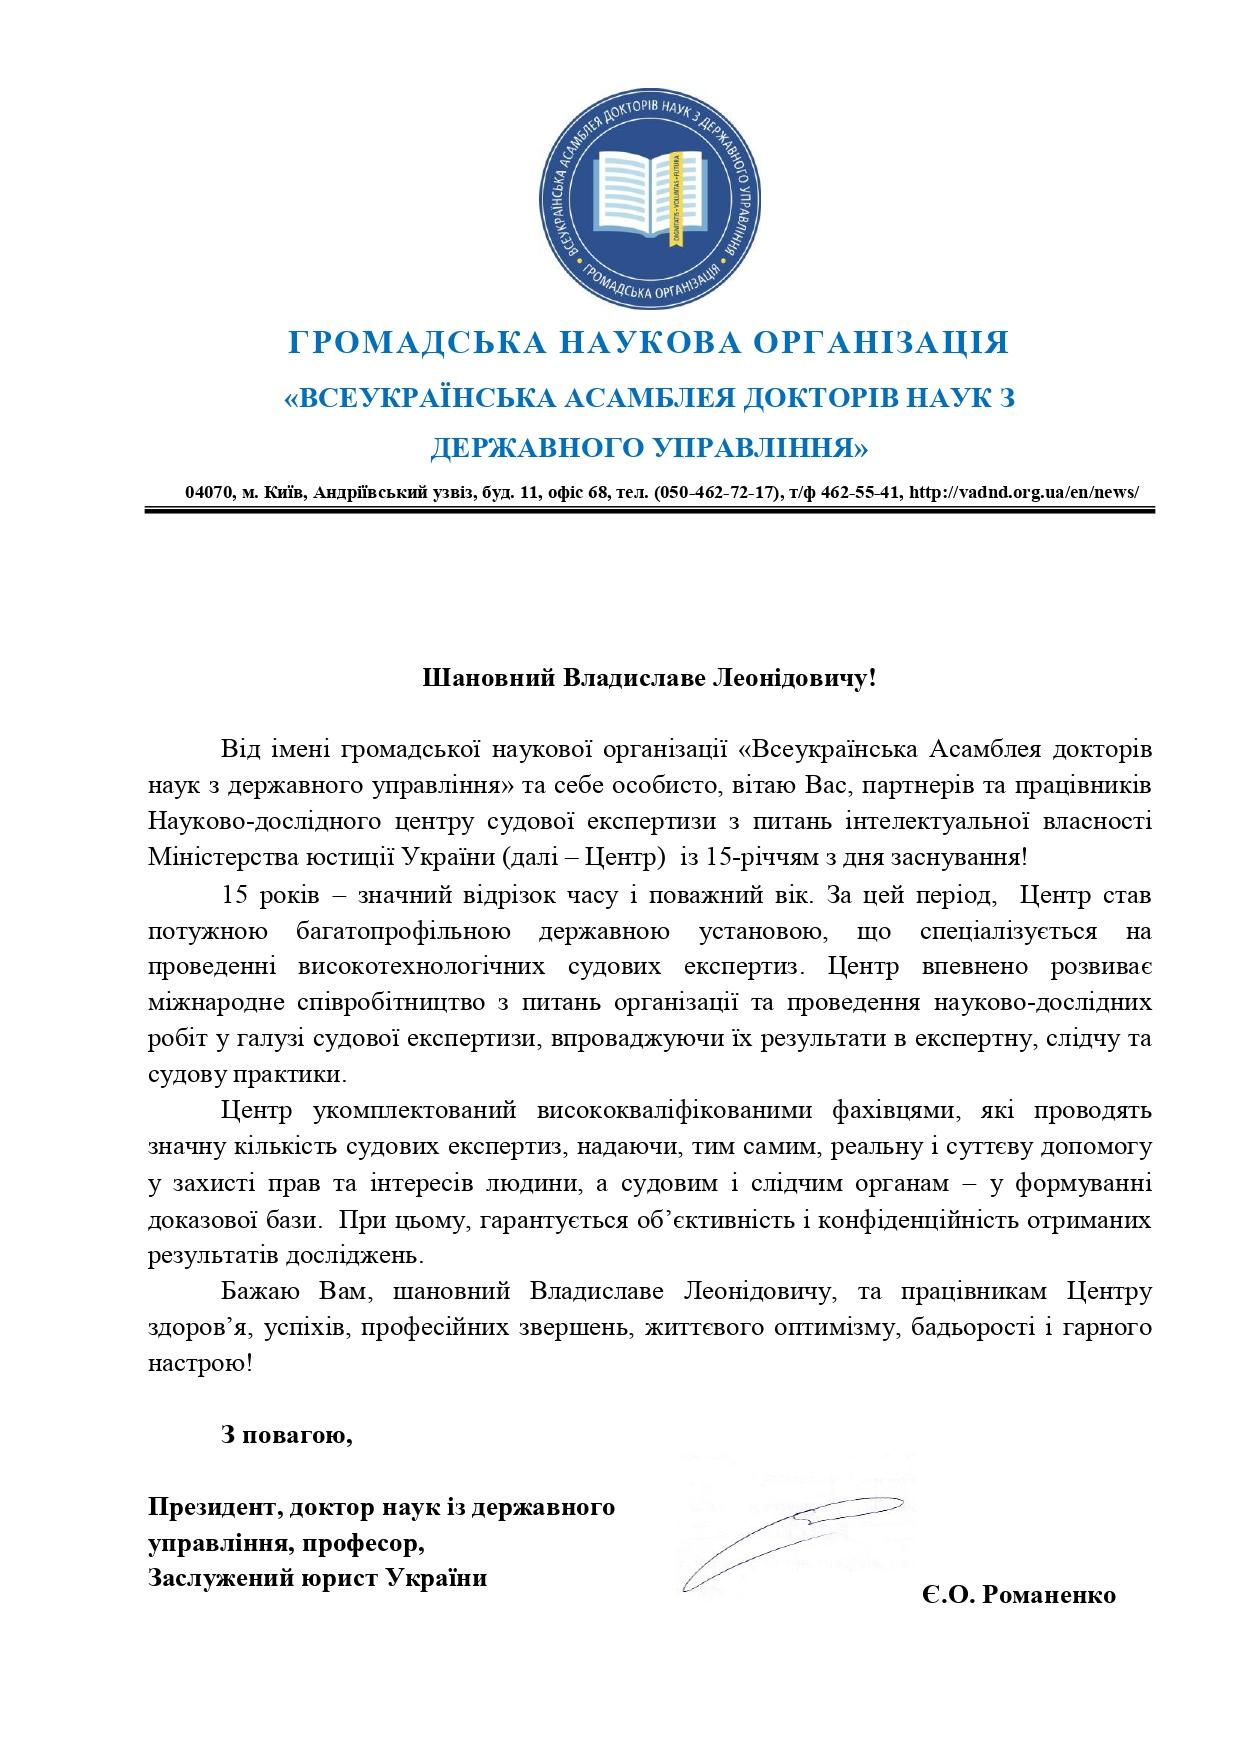 Congratulation_letter